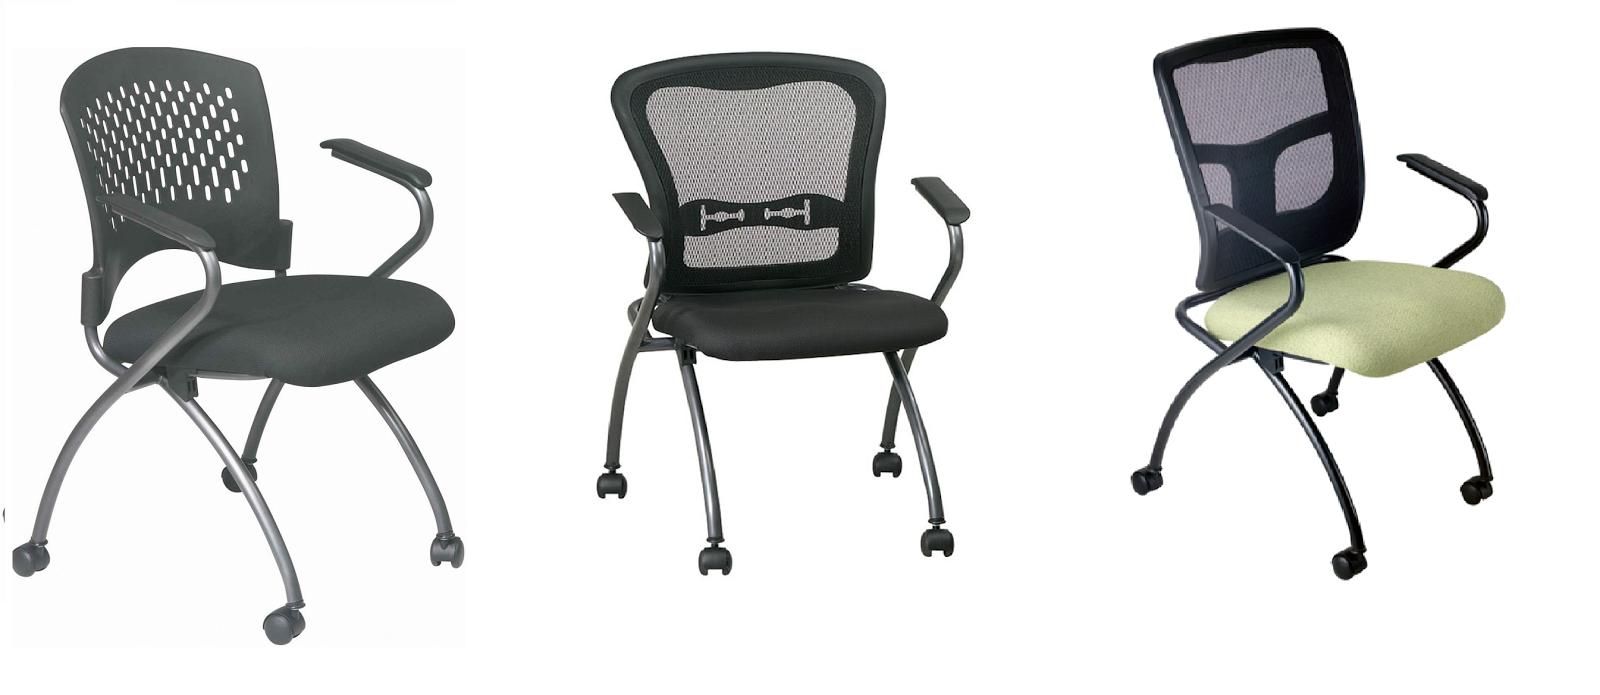 Cheap Folding Chairs